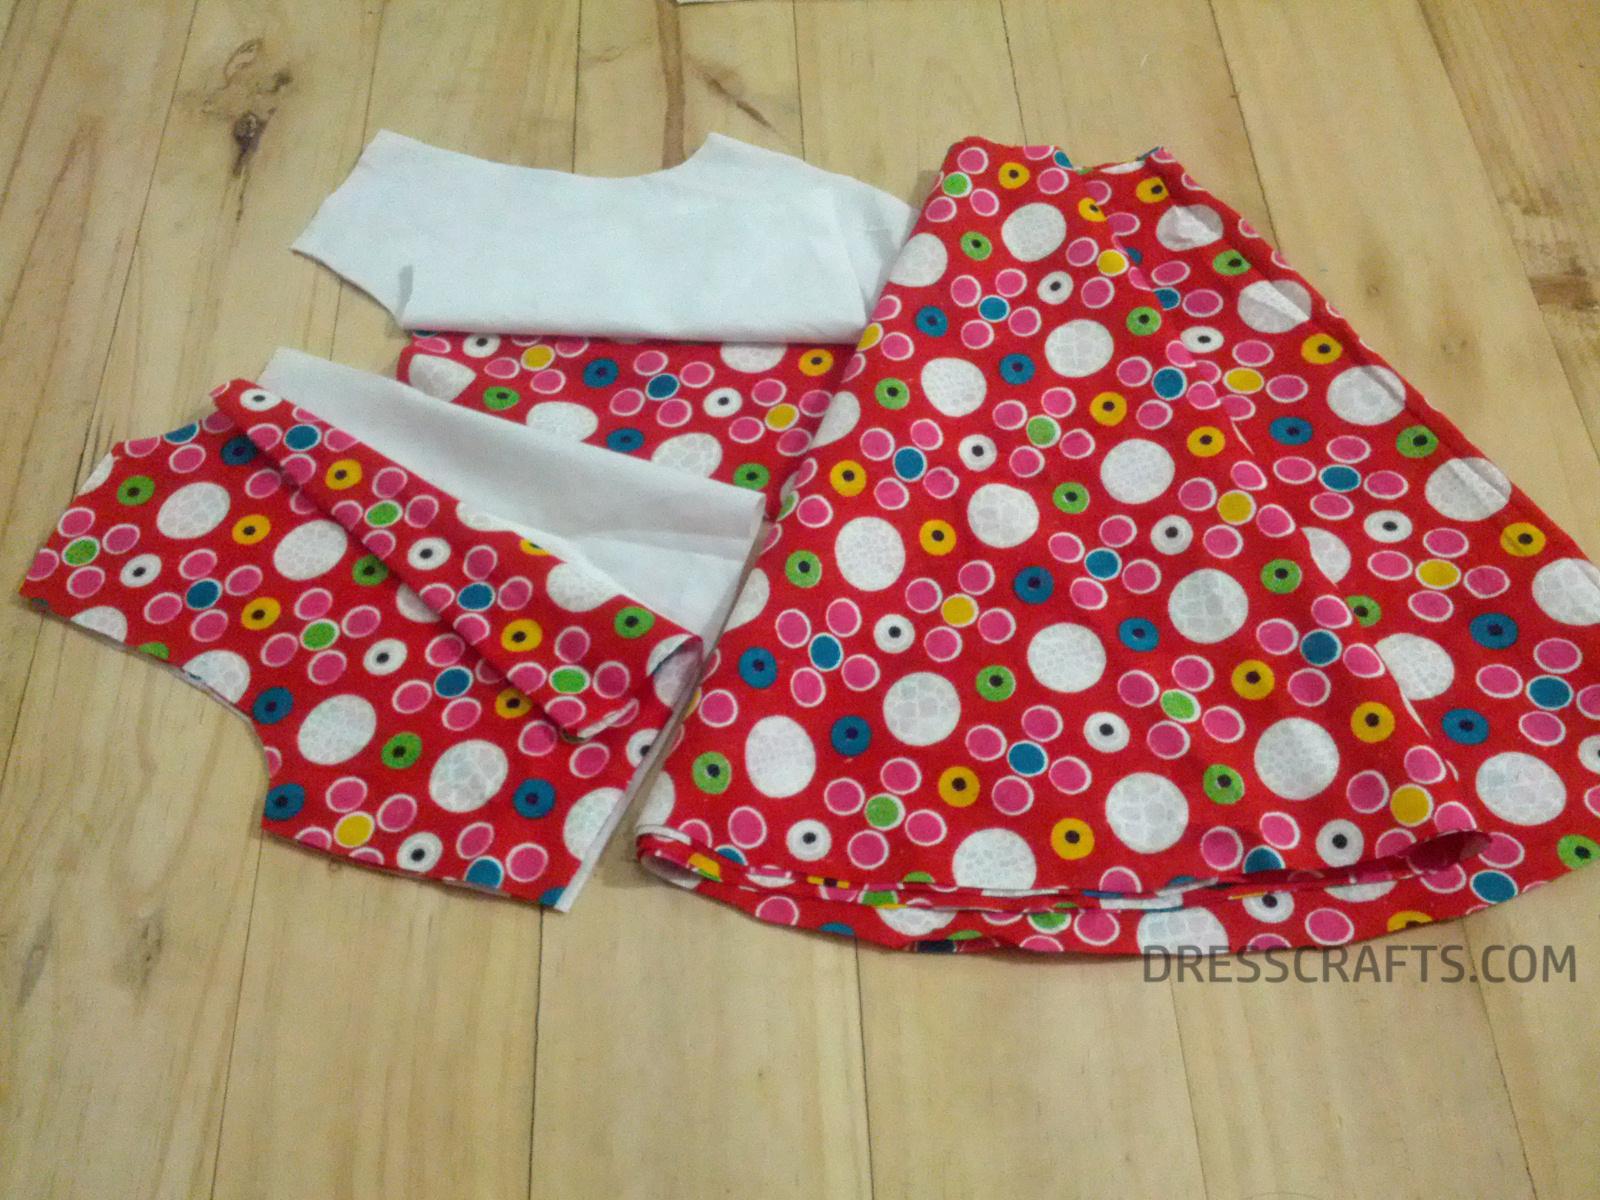 Full Cutting Circle Skirt Dress